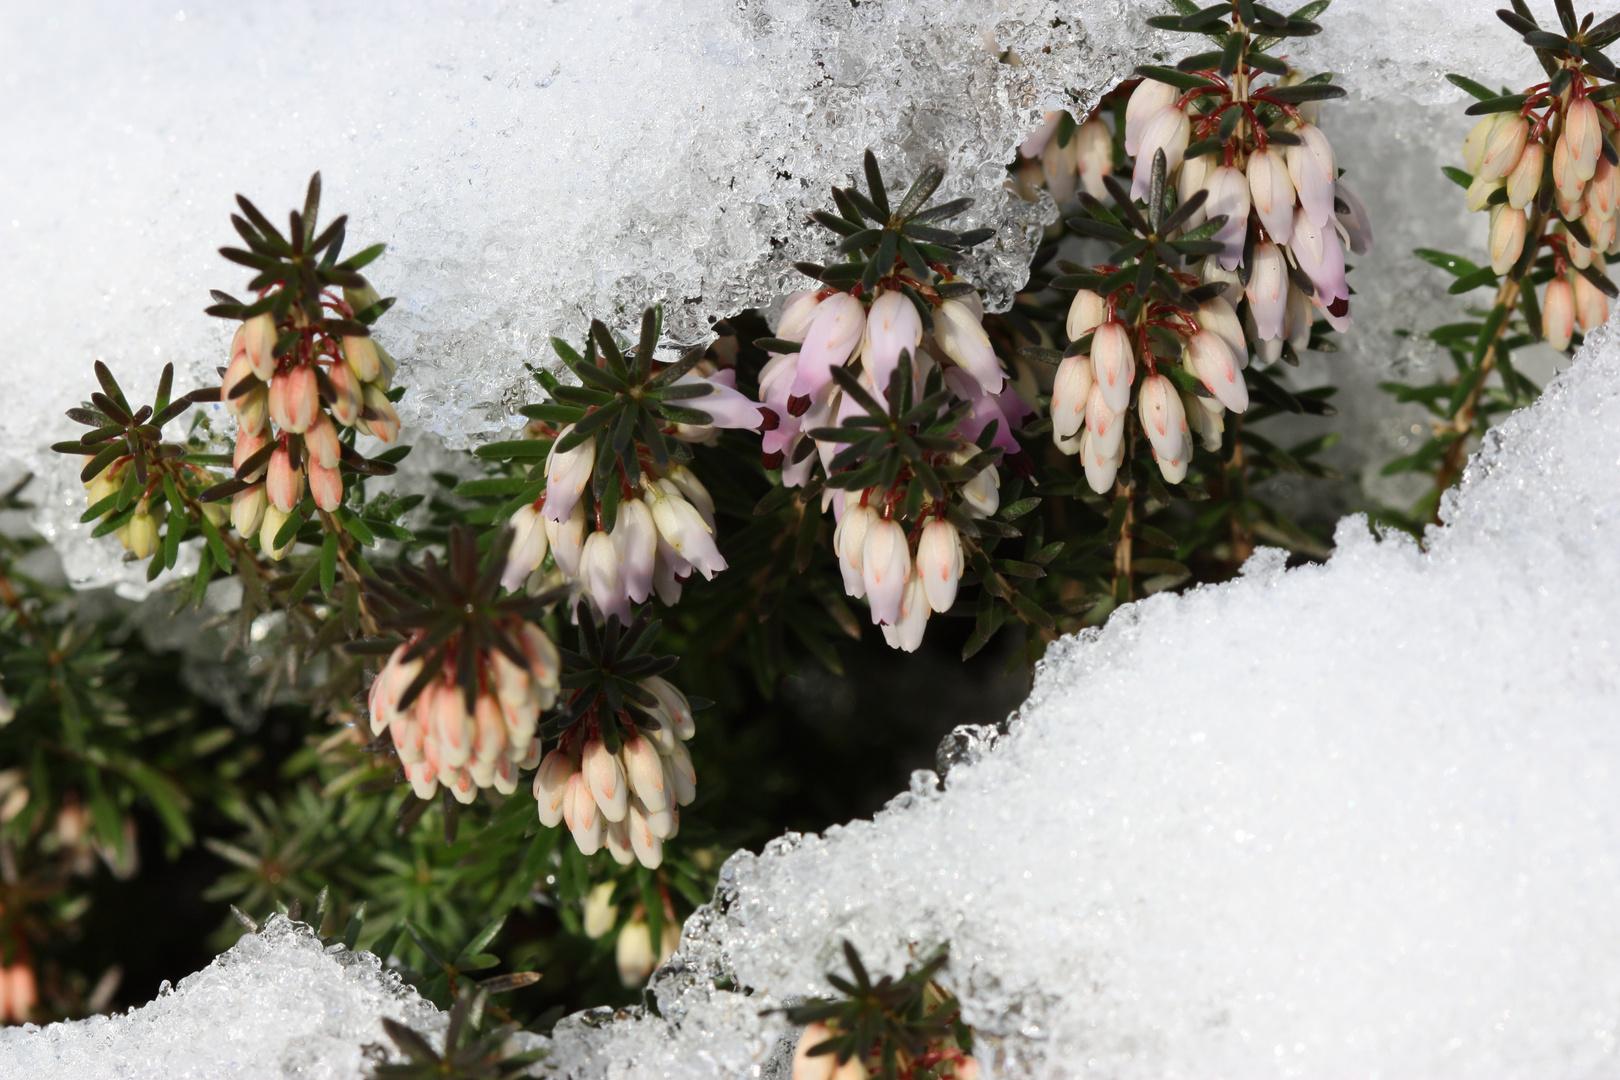 Erika im Schnee II